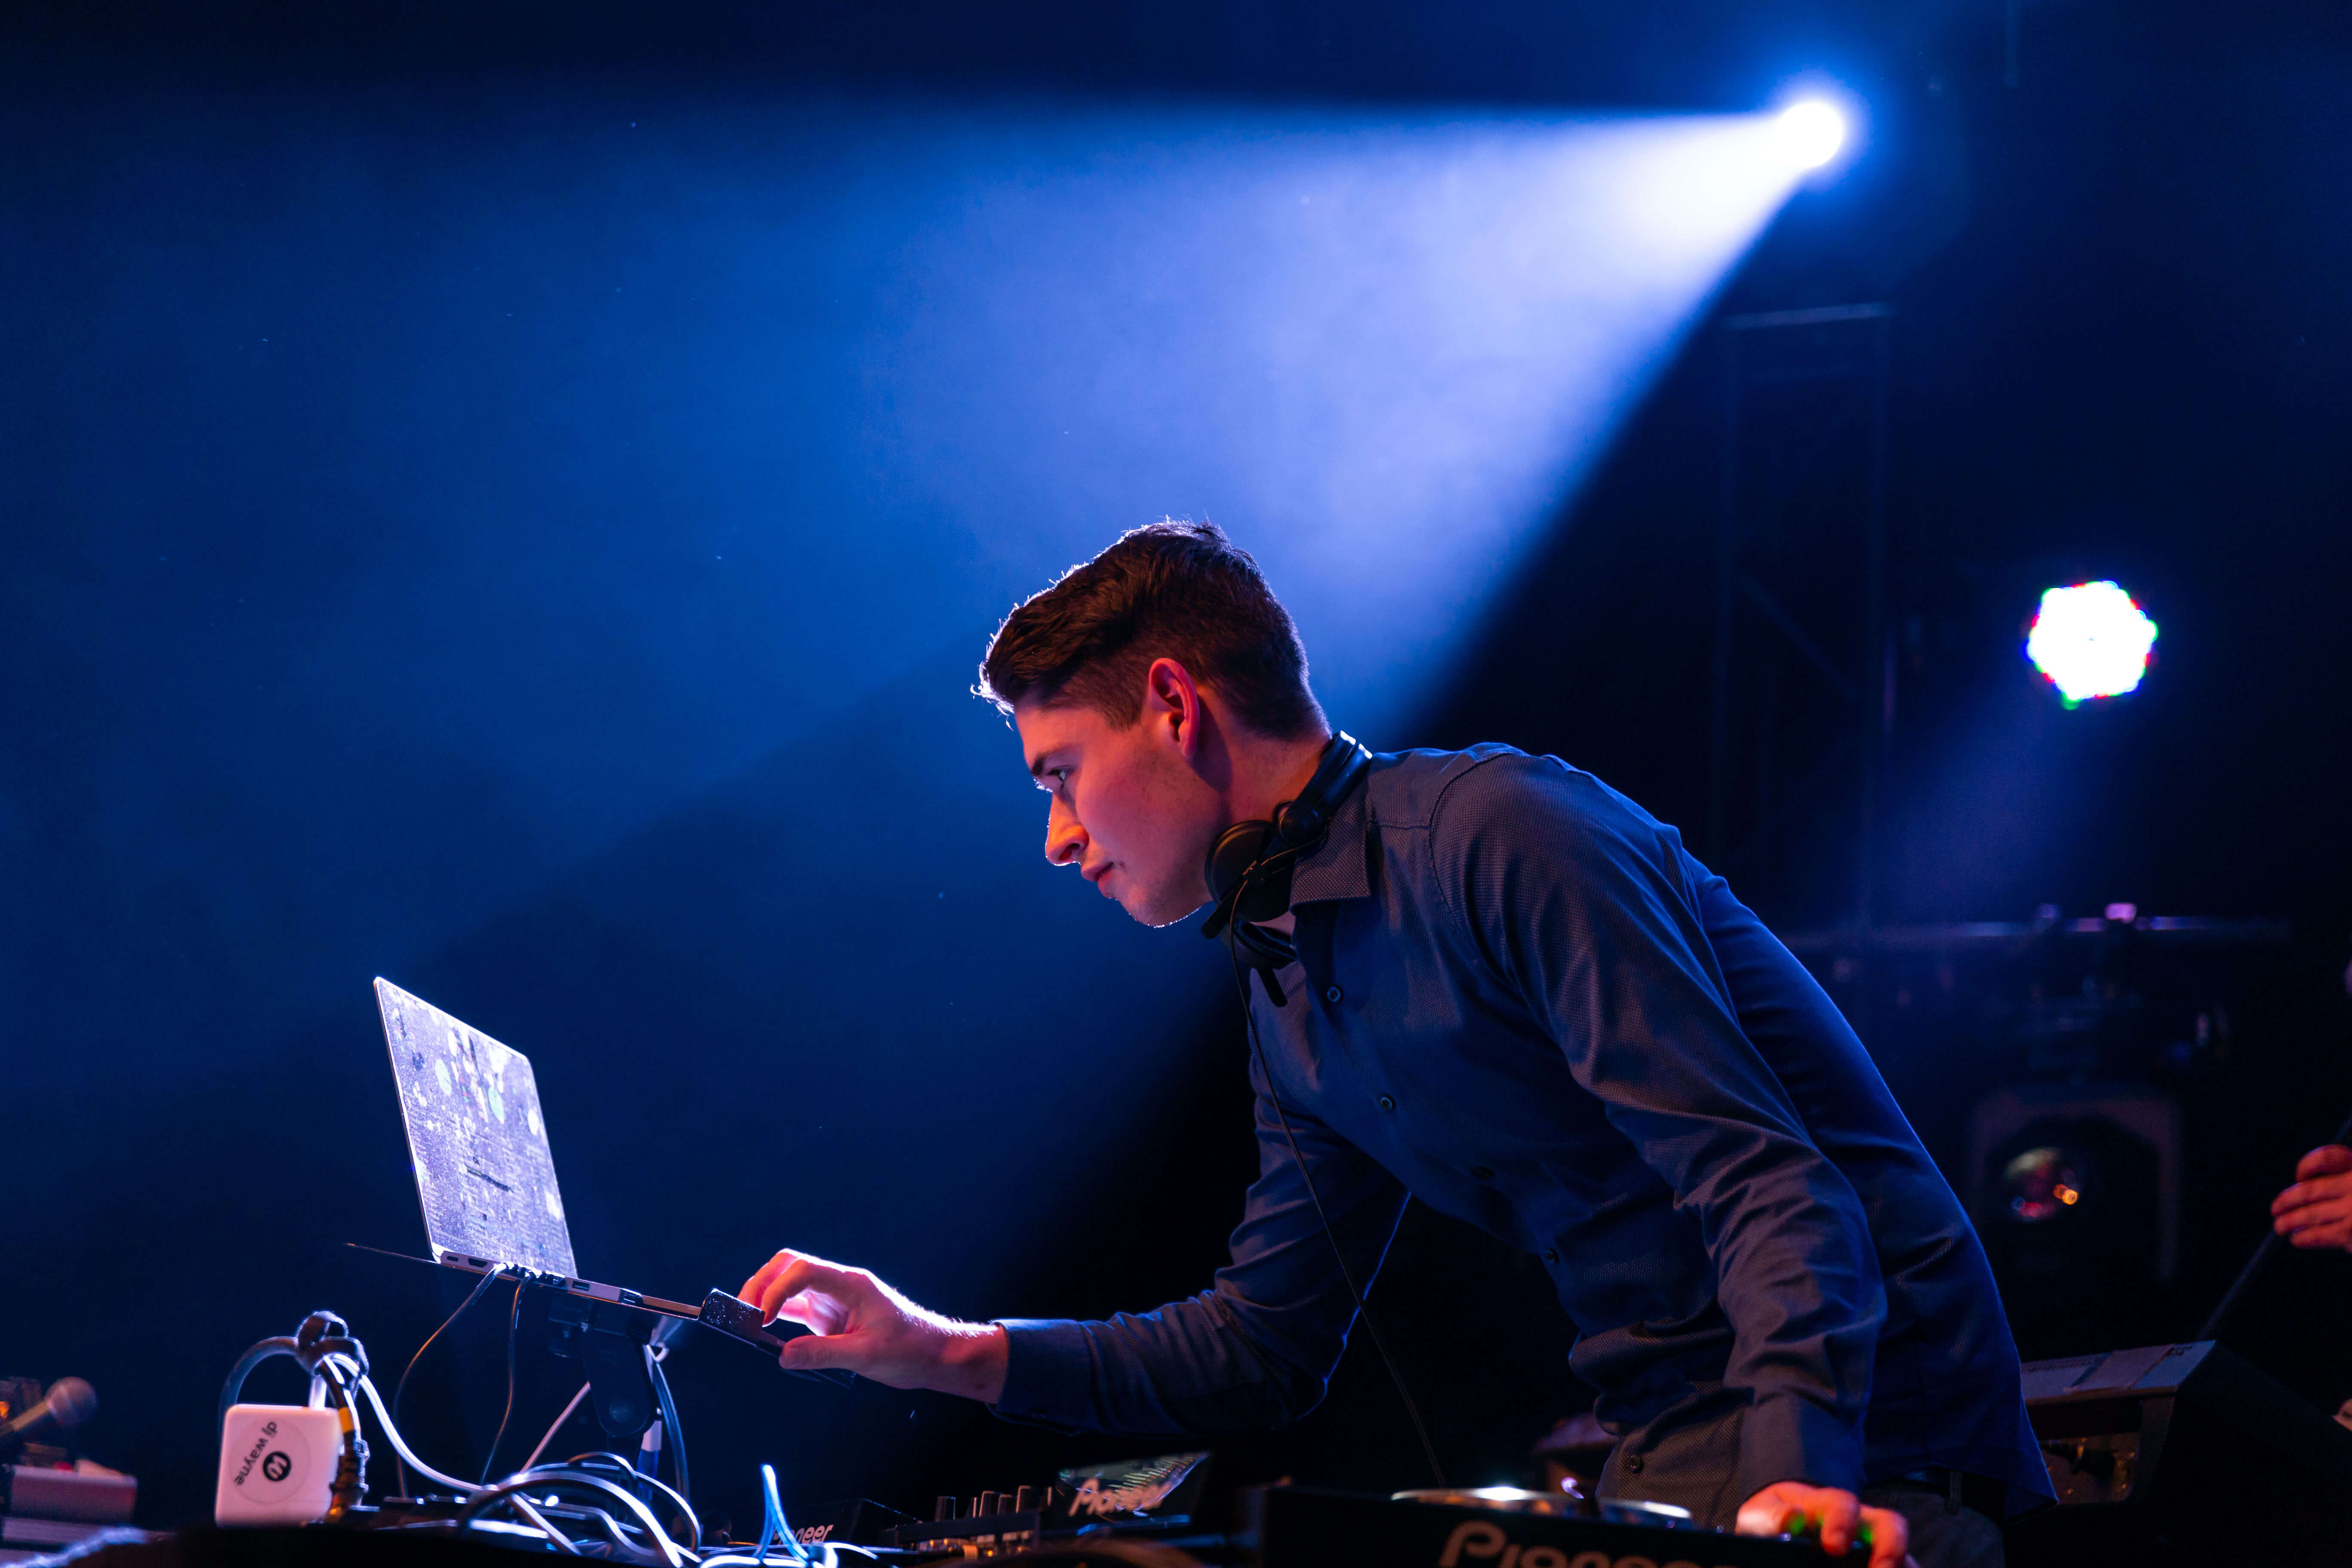 DJ Wayne Rottweil